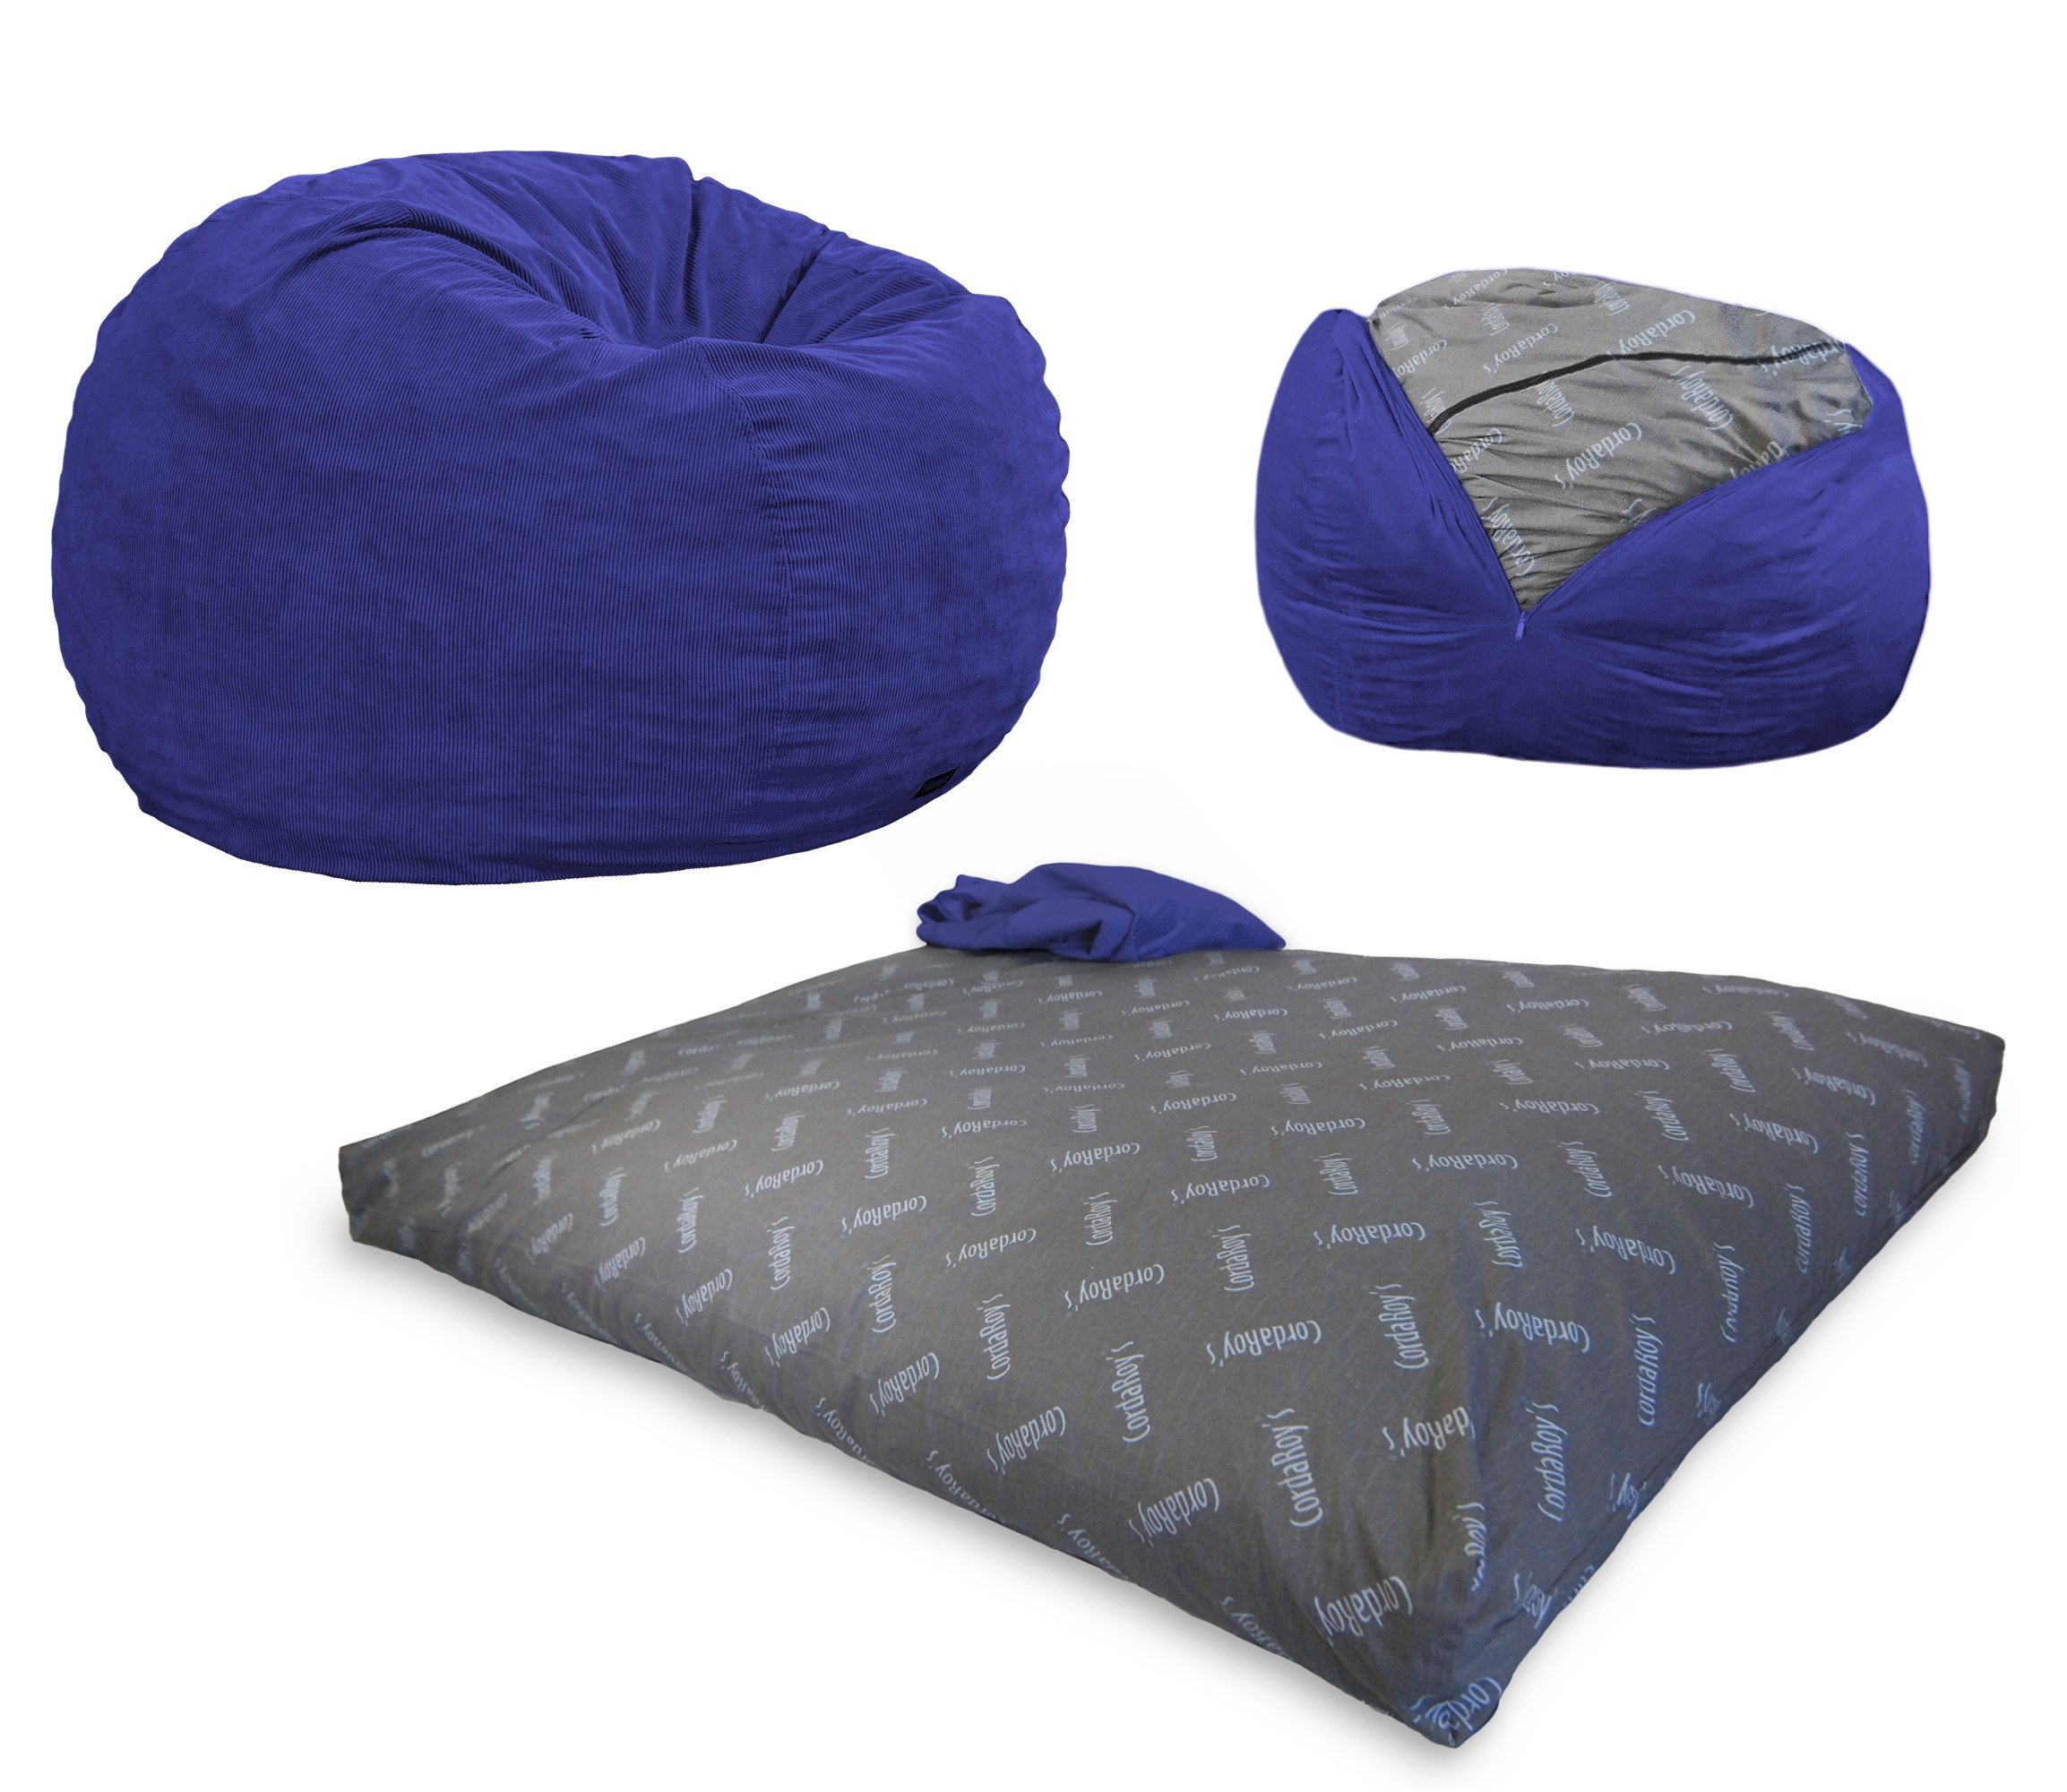 CordaRoy's - Navy Blue Corduroy Convertible Bean Bag Chair - Queen by CordaRoy's